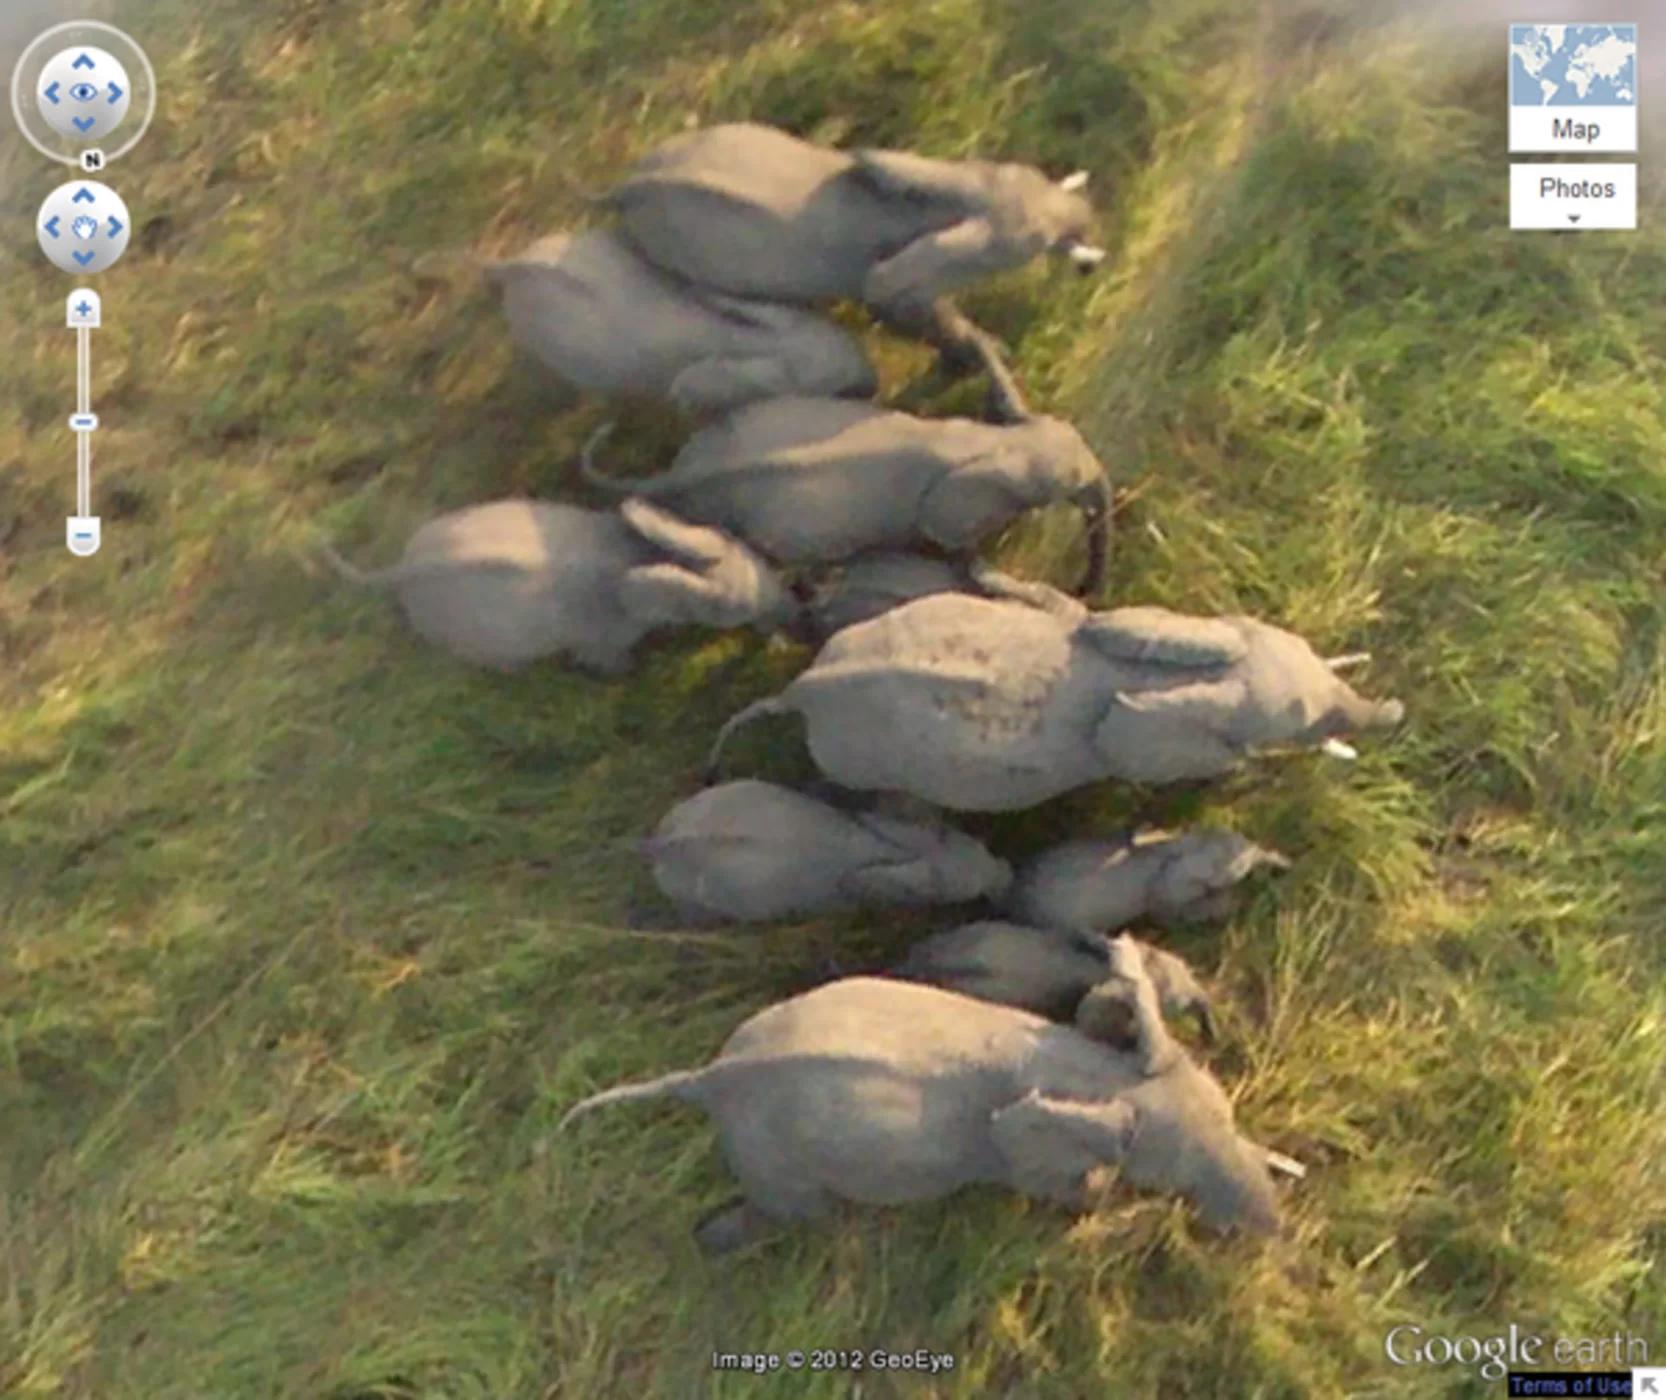 Image credits: Google Earth